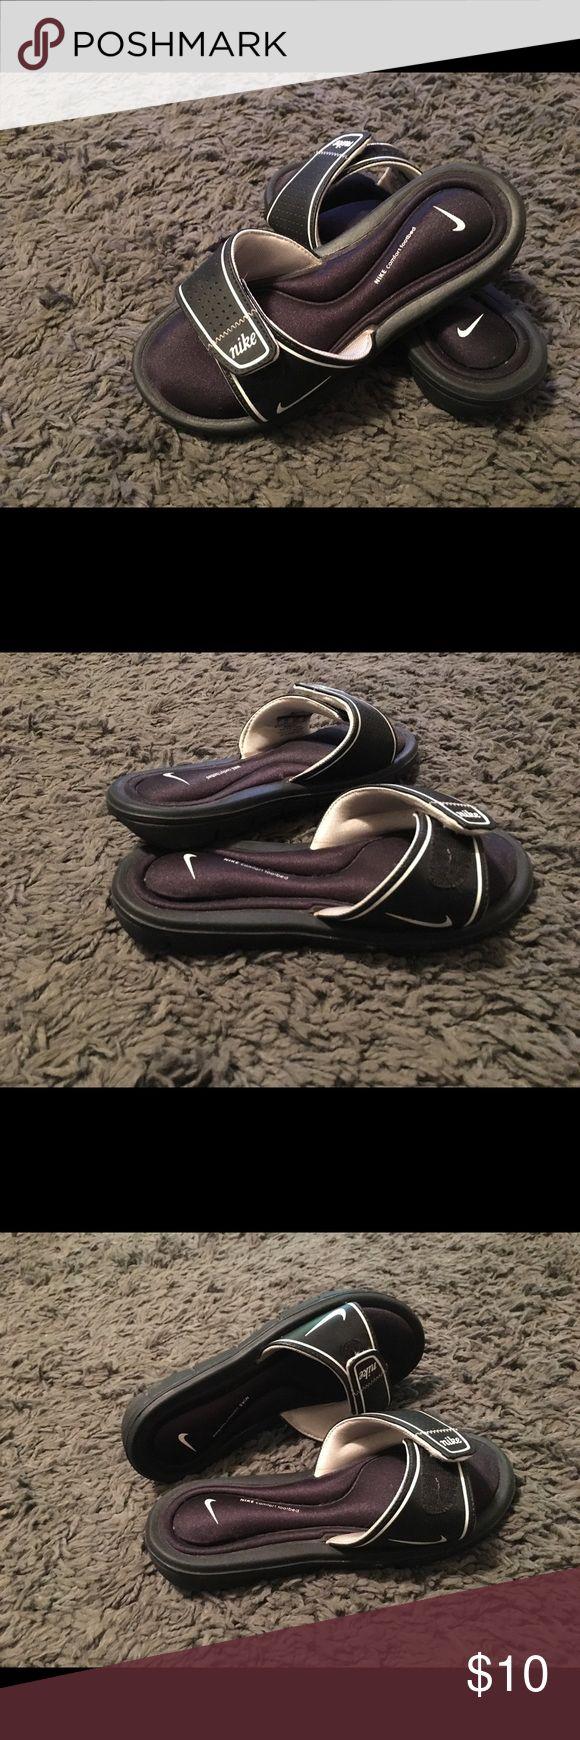 Women's Nike Sandals Size 5 Nike women's slip on sandals Nike Shoes Sandals